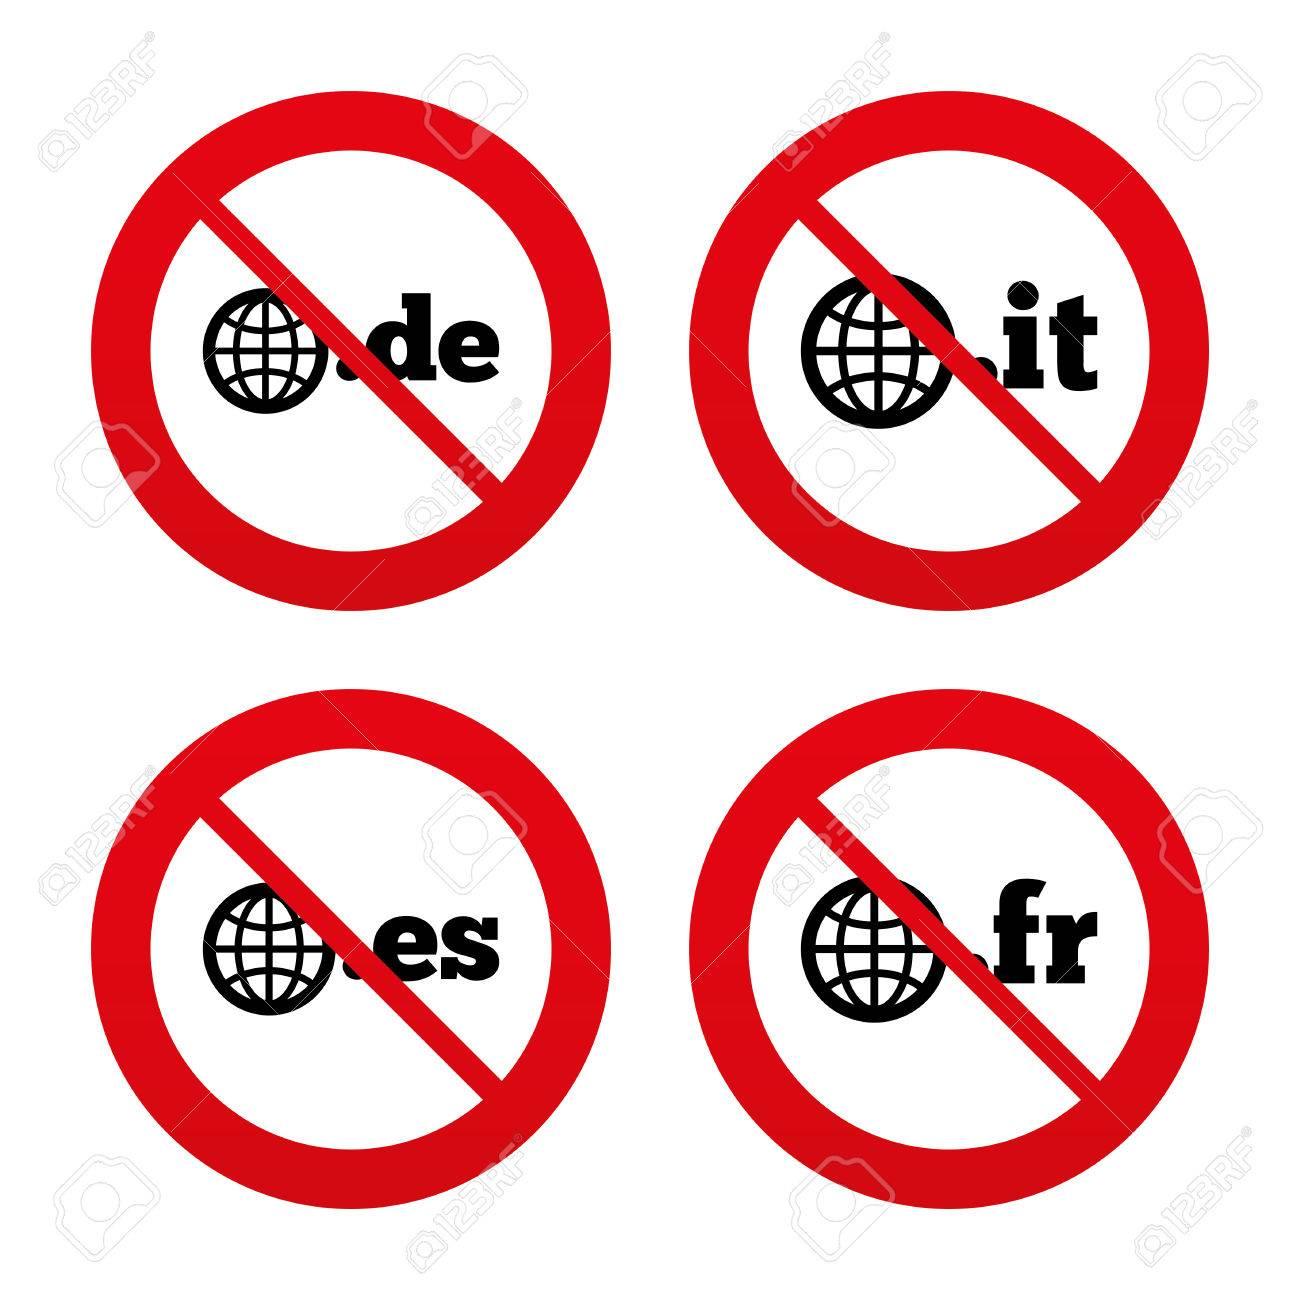 No Ban Or Stop Signs Top Level Internet Domain Icons De It